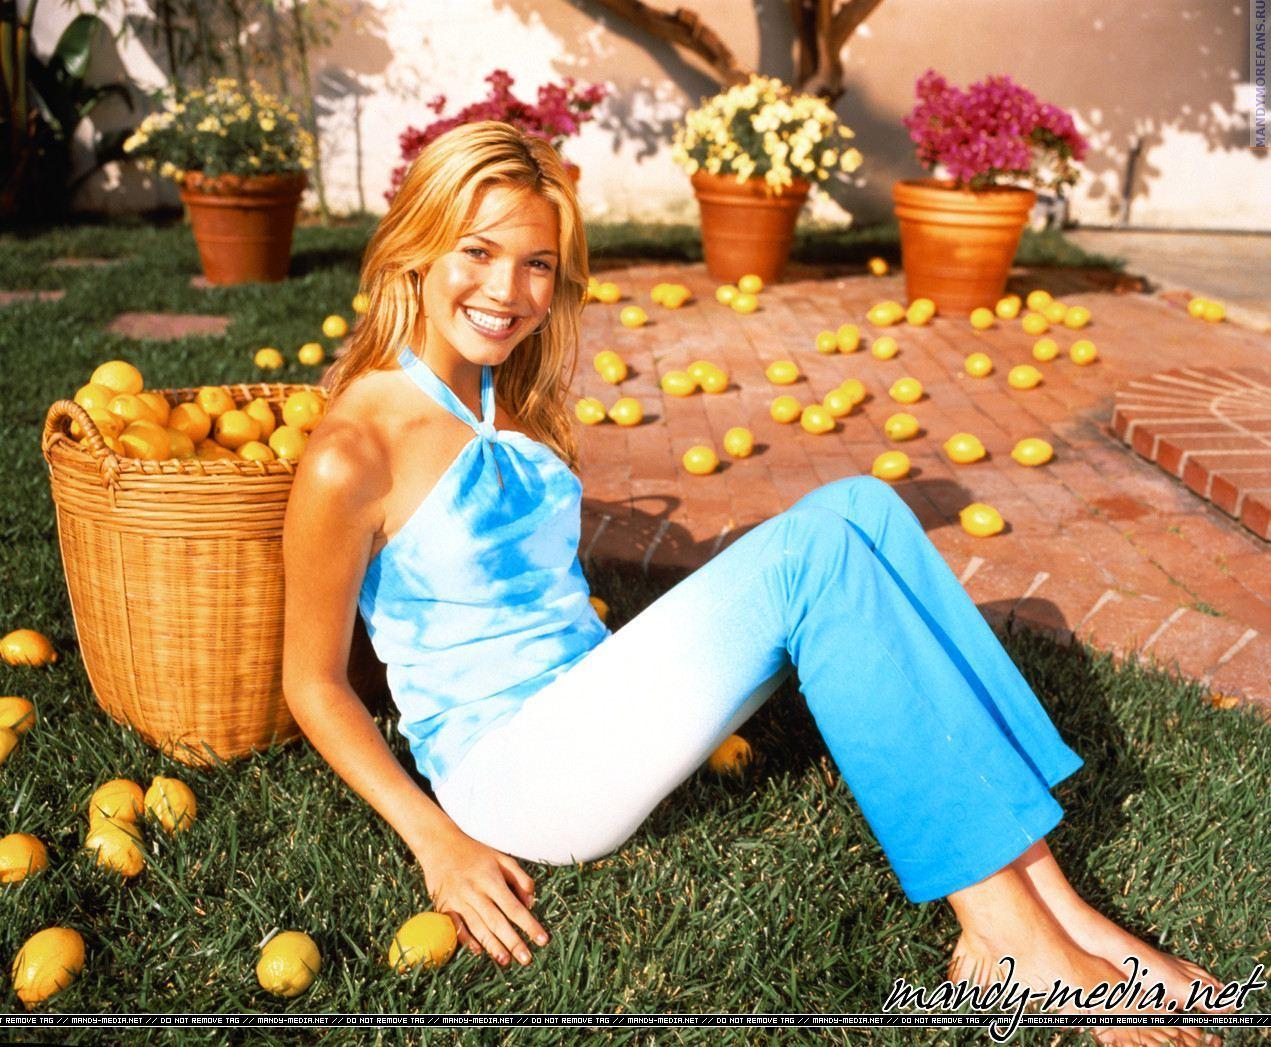 https://pics.wikifeet.com/Mandy-Moore-Feet-473979.jpg